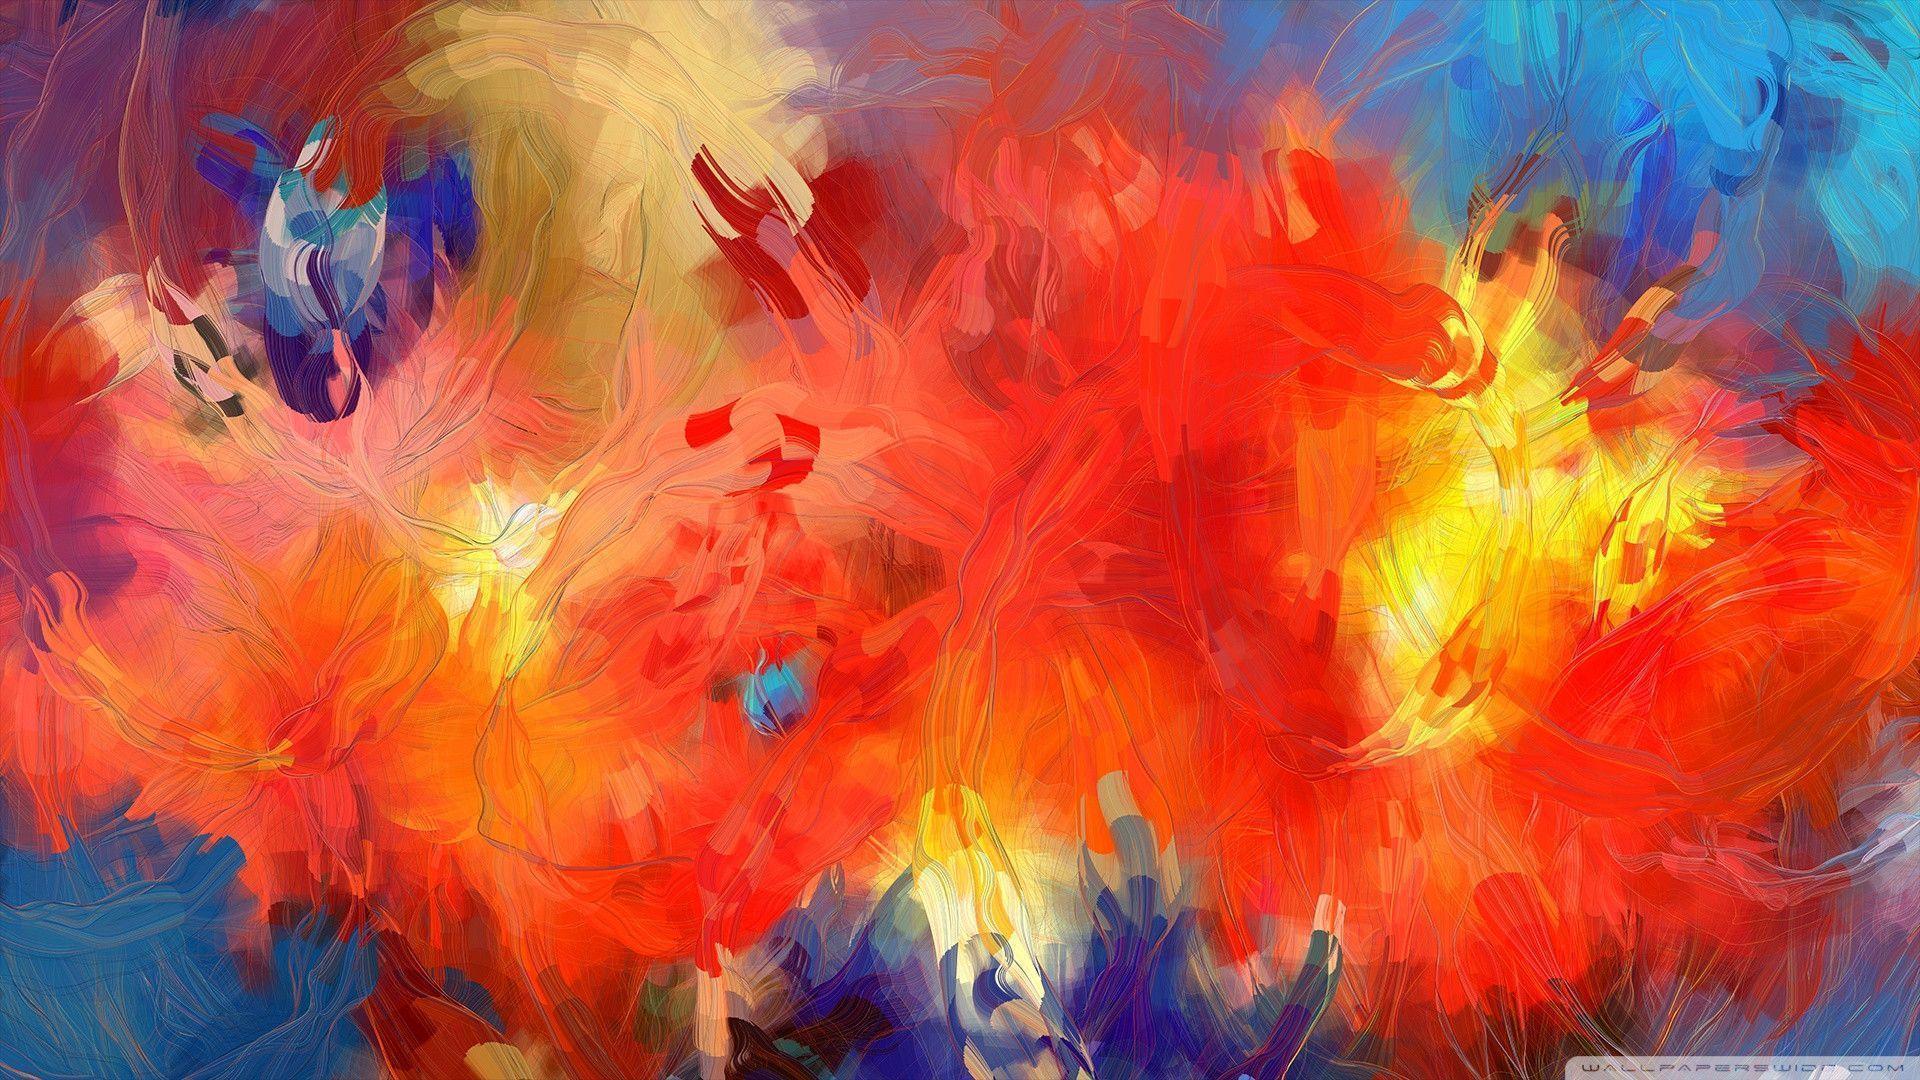 Abstract Art, Abstract Wallpaper, hd phone wallpapers ~ Wallko.com